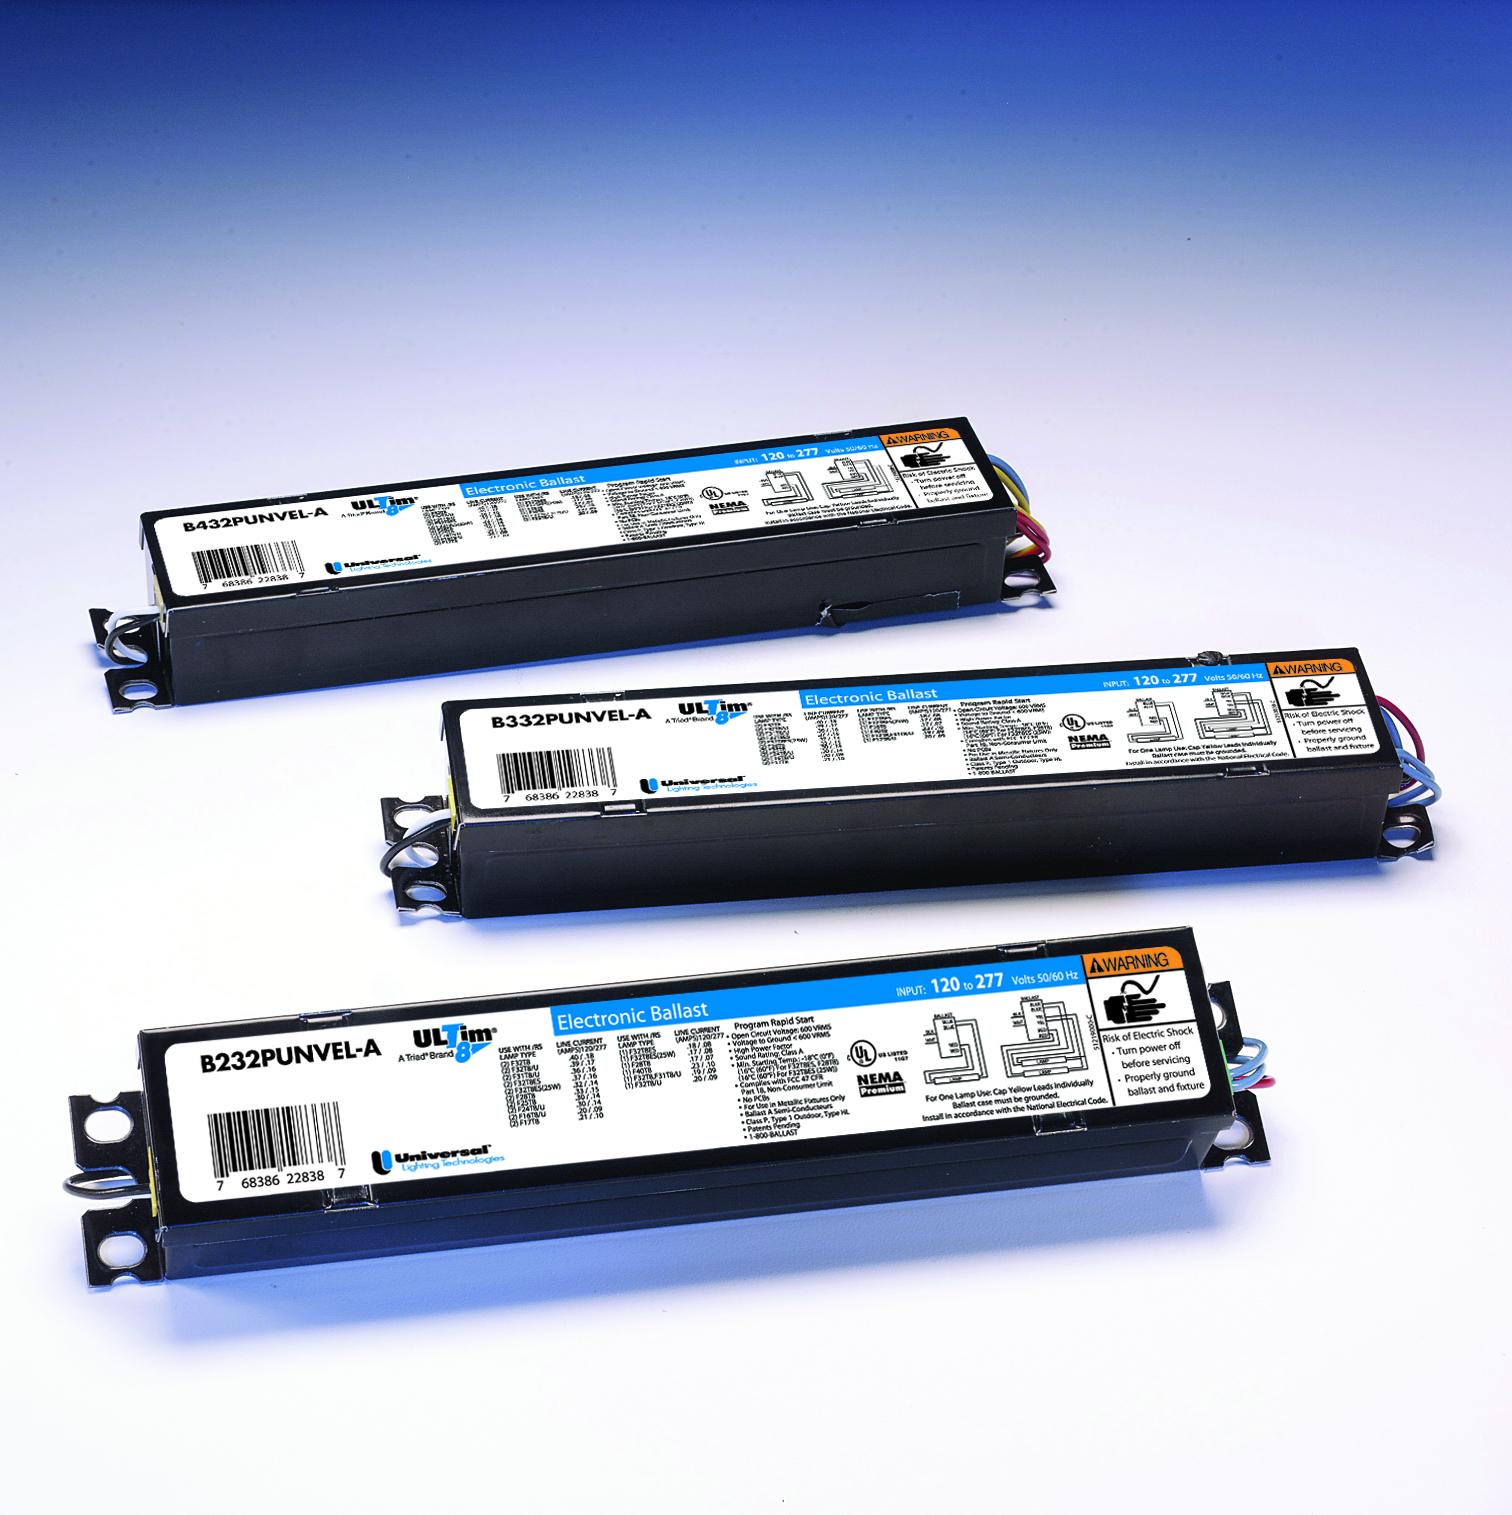 Universal Lighting Technologies B260IUNVHP000I UNIVERSAL LIGHTING TECH B260IUNVHP000I